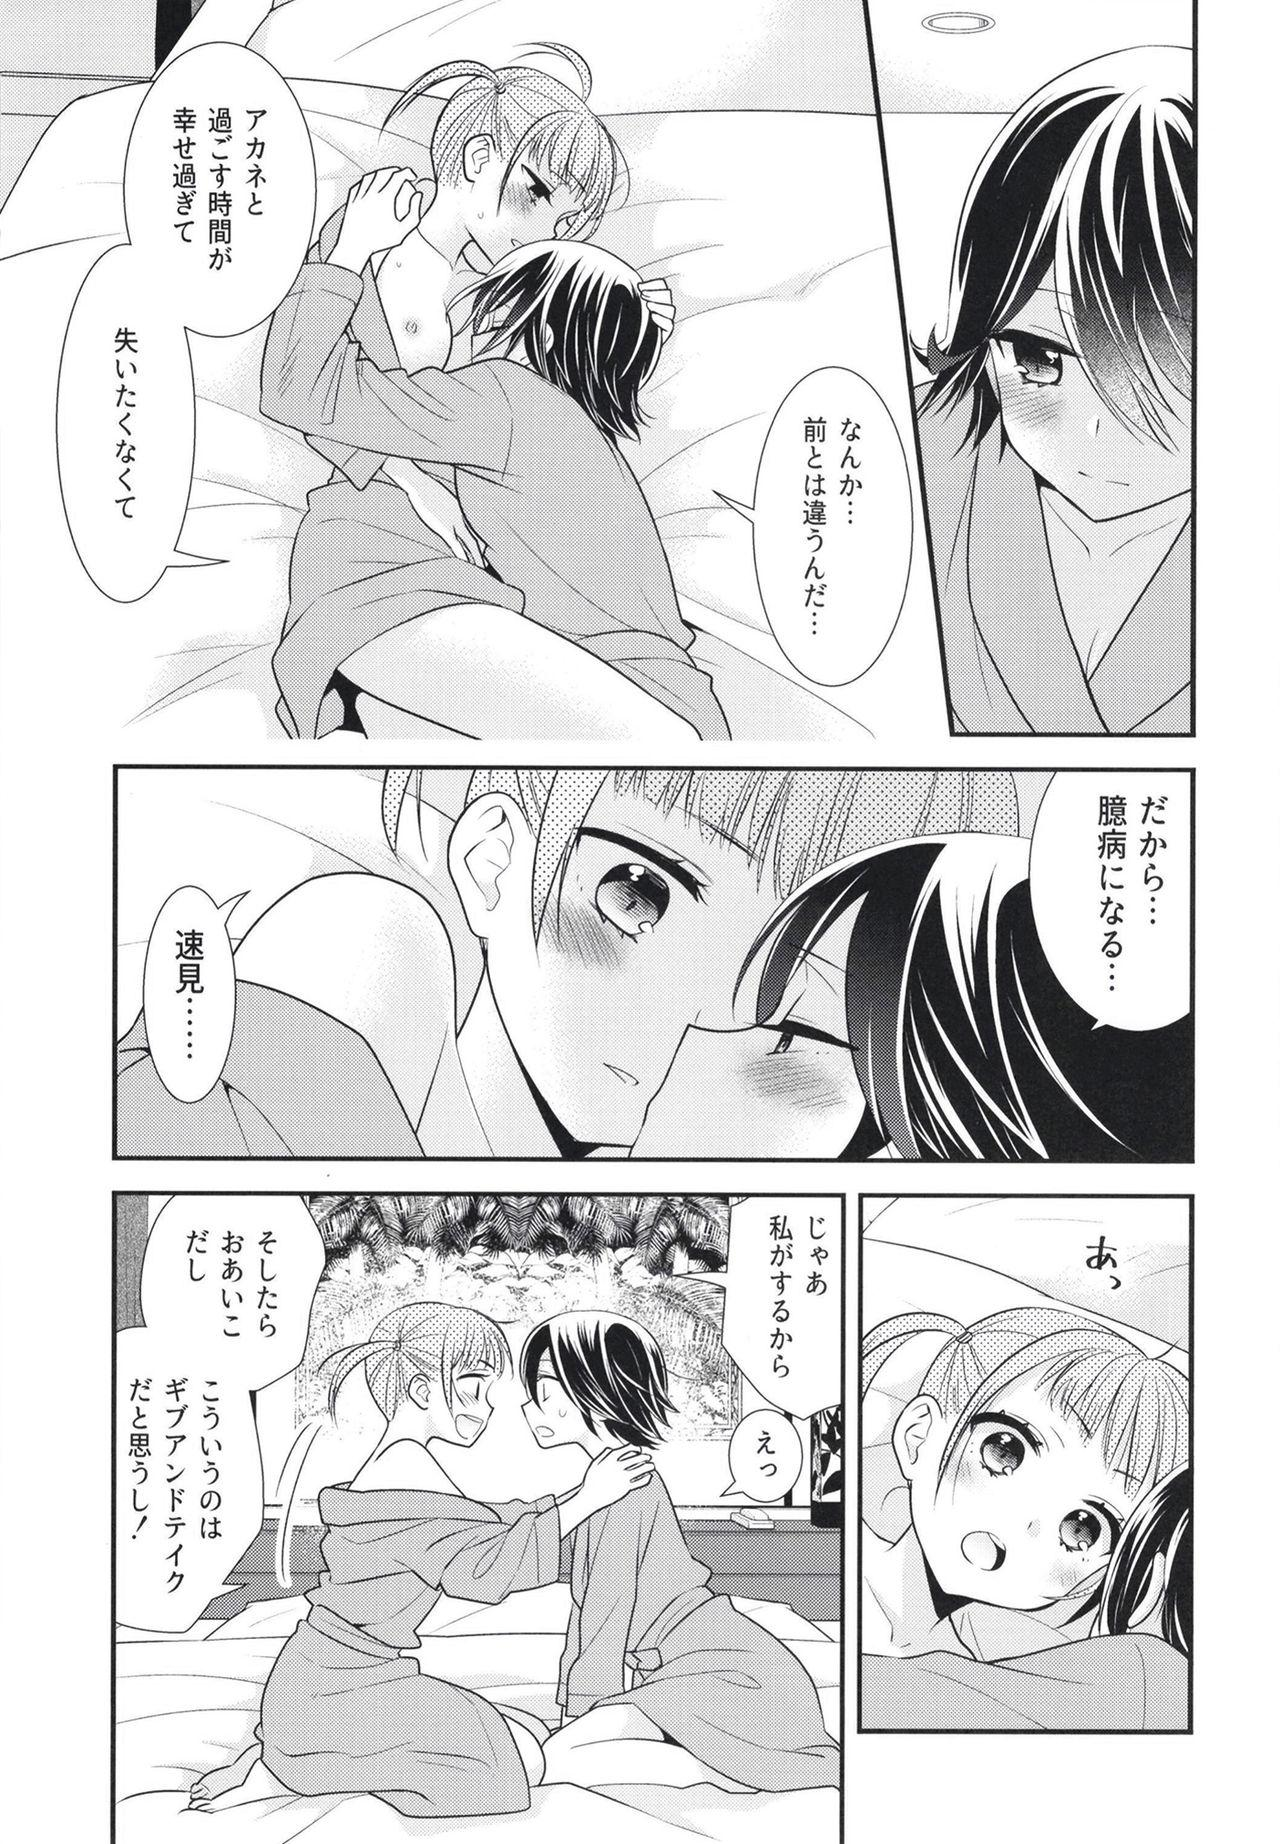 Sawarukara, Sawatte. 22